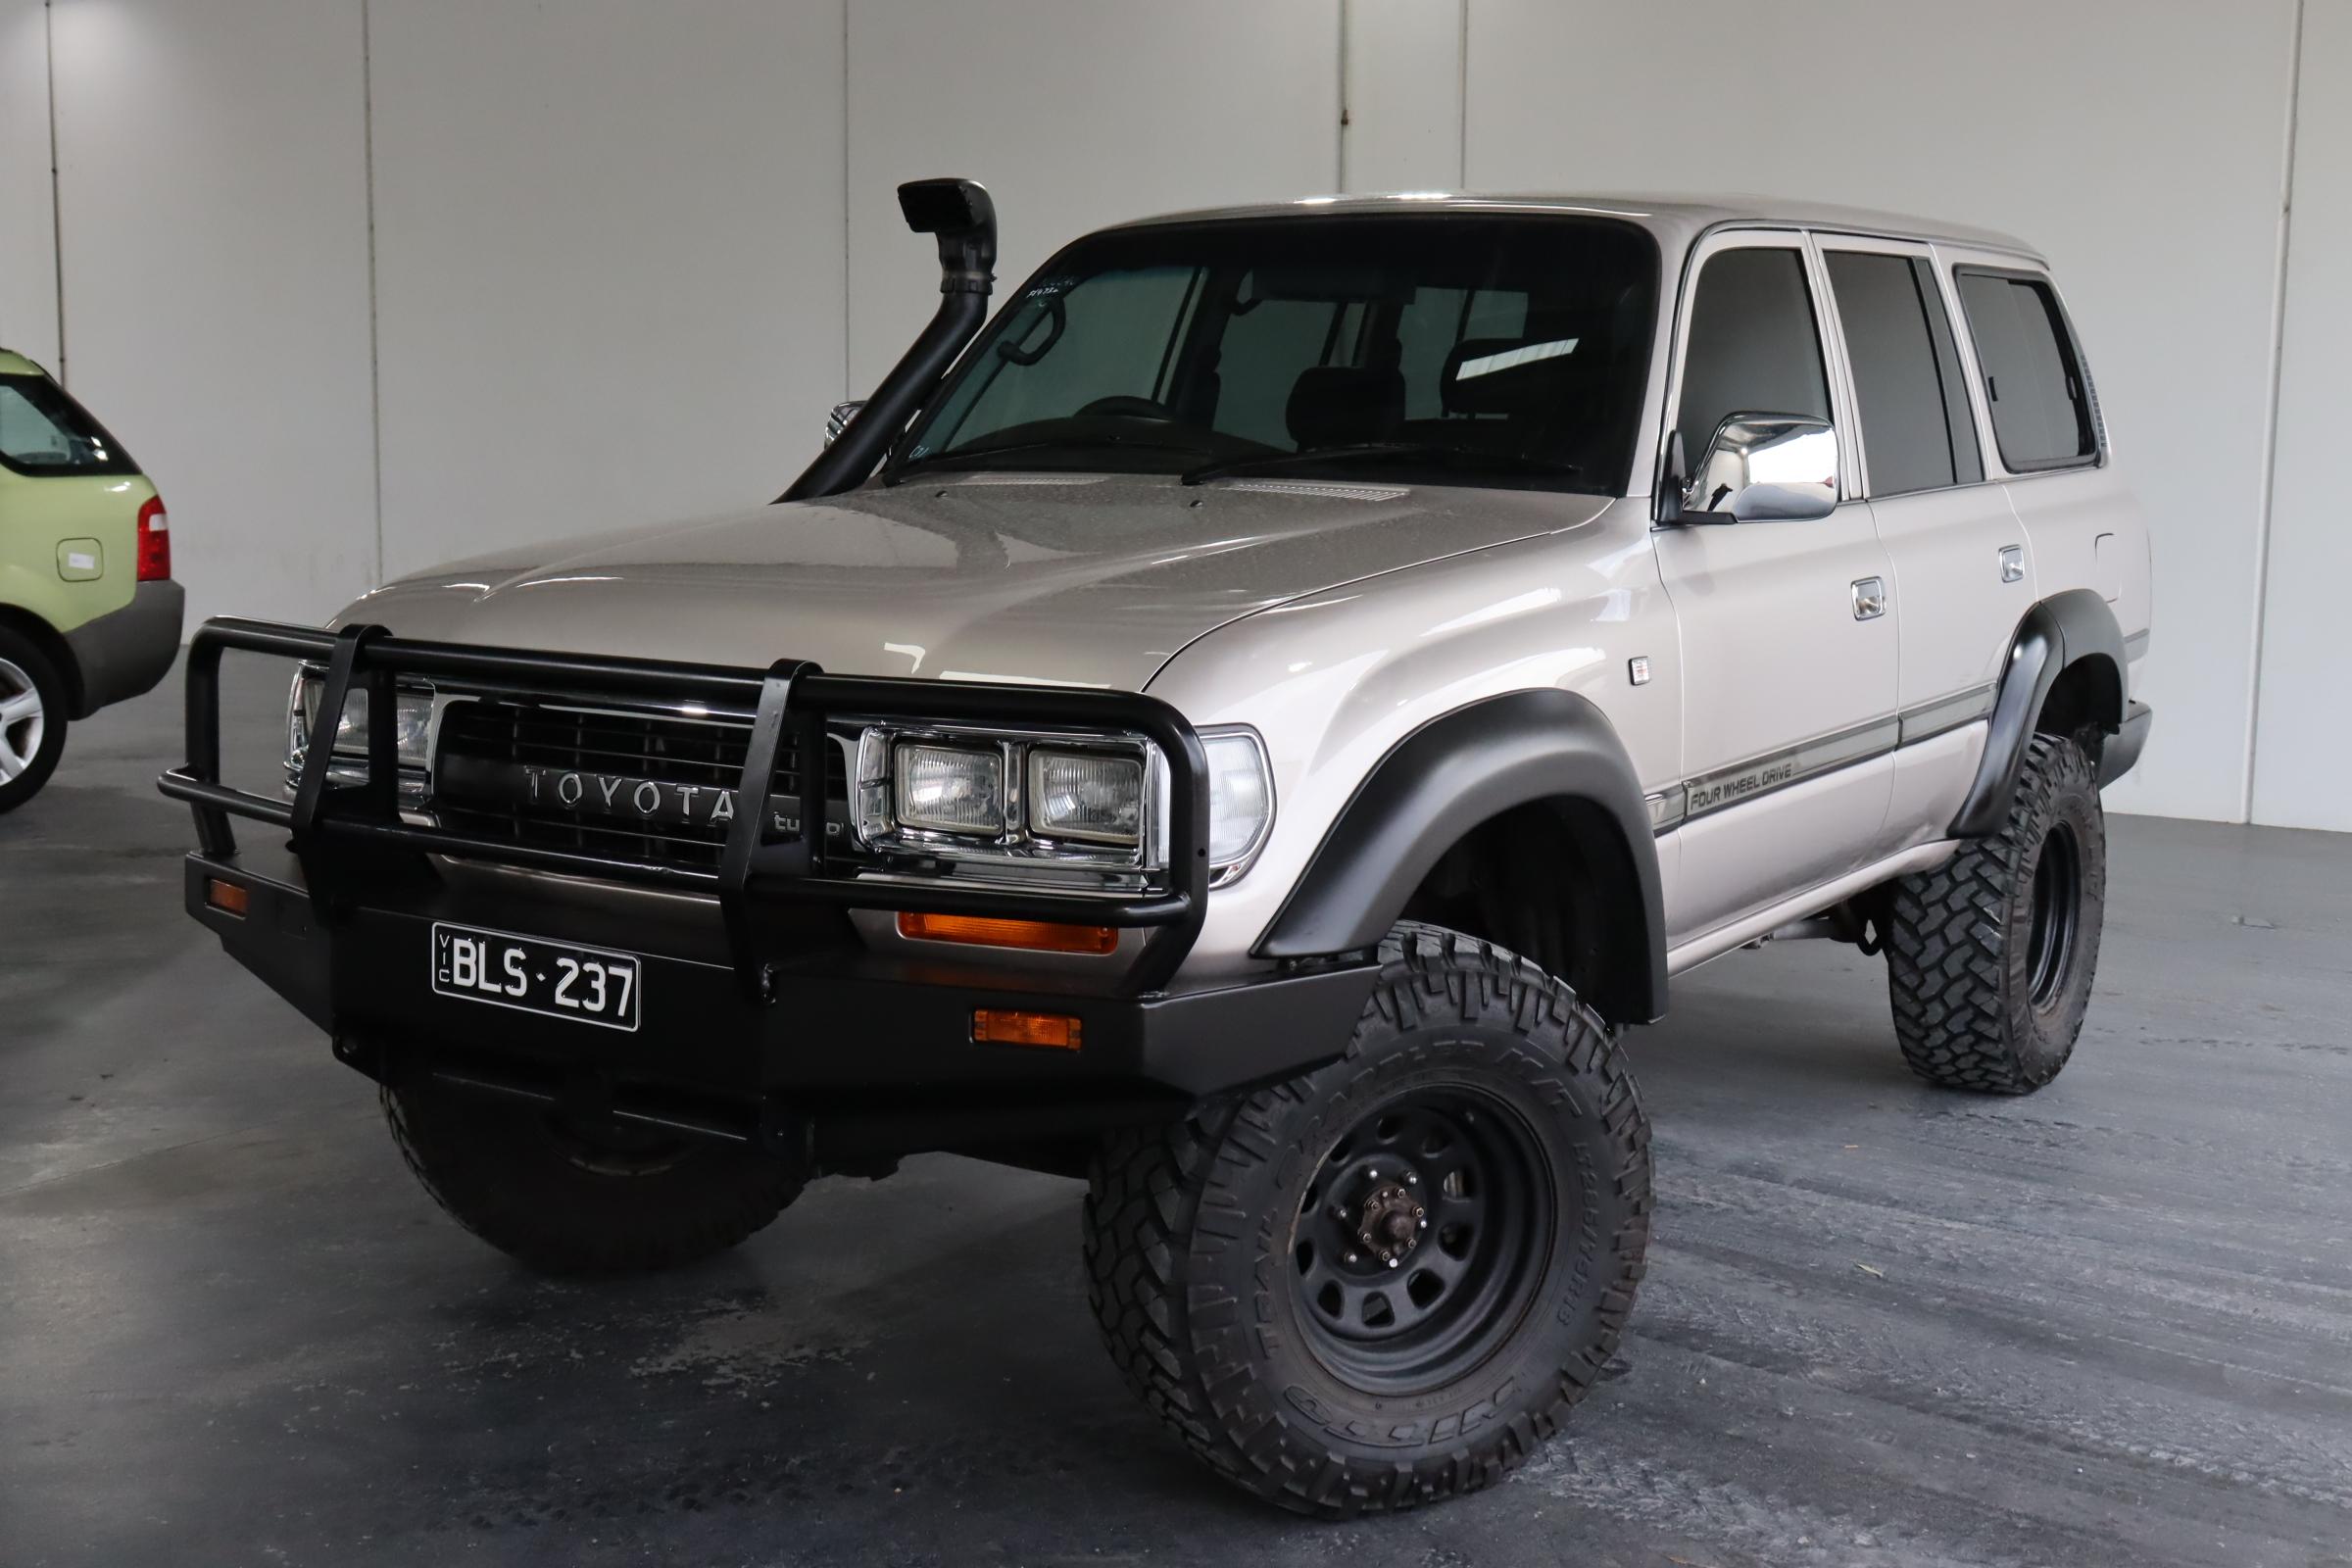 1992 Toyota Landcruiser GXL (4x4) HDJ80 Turbo Diesel (Fully Restored)